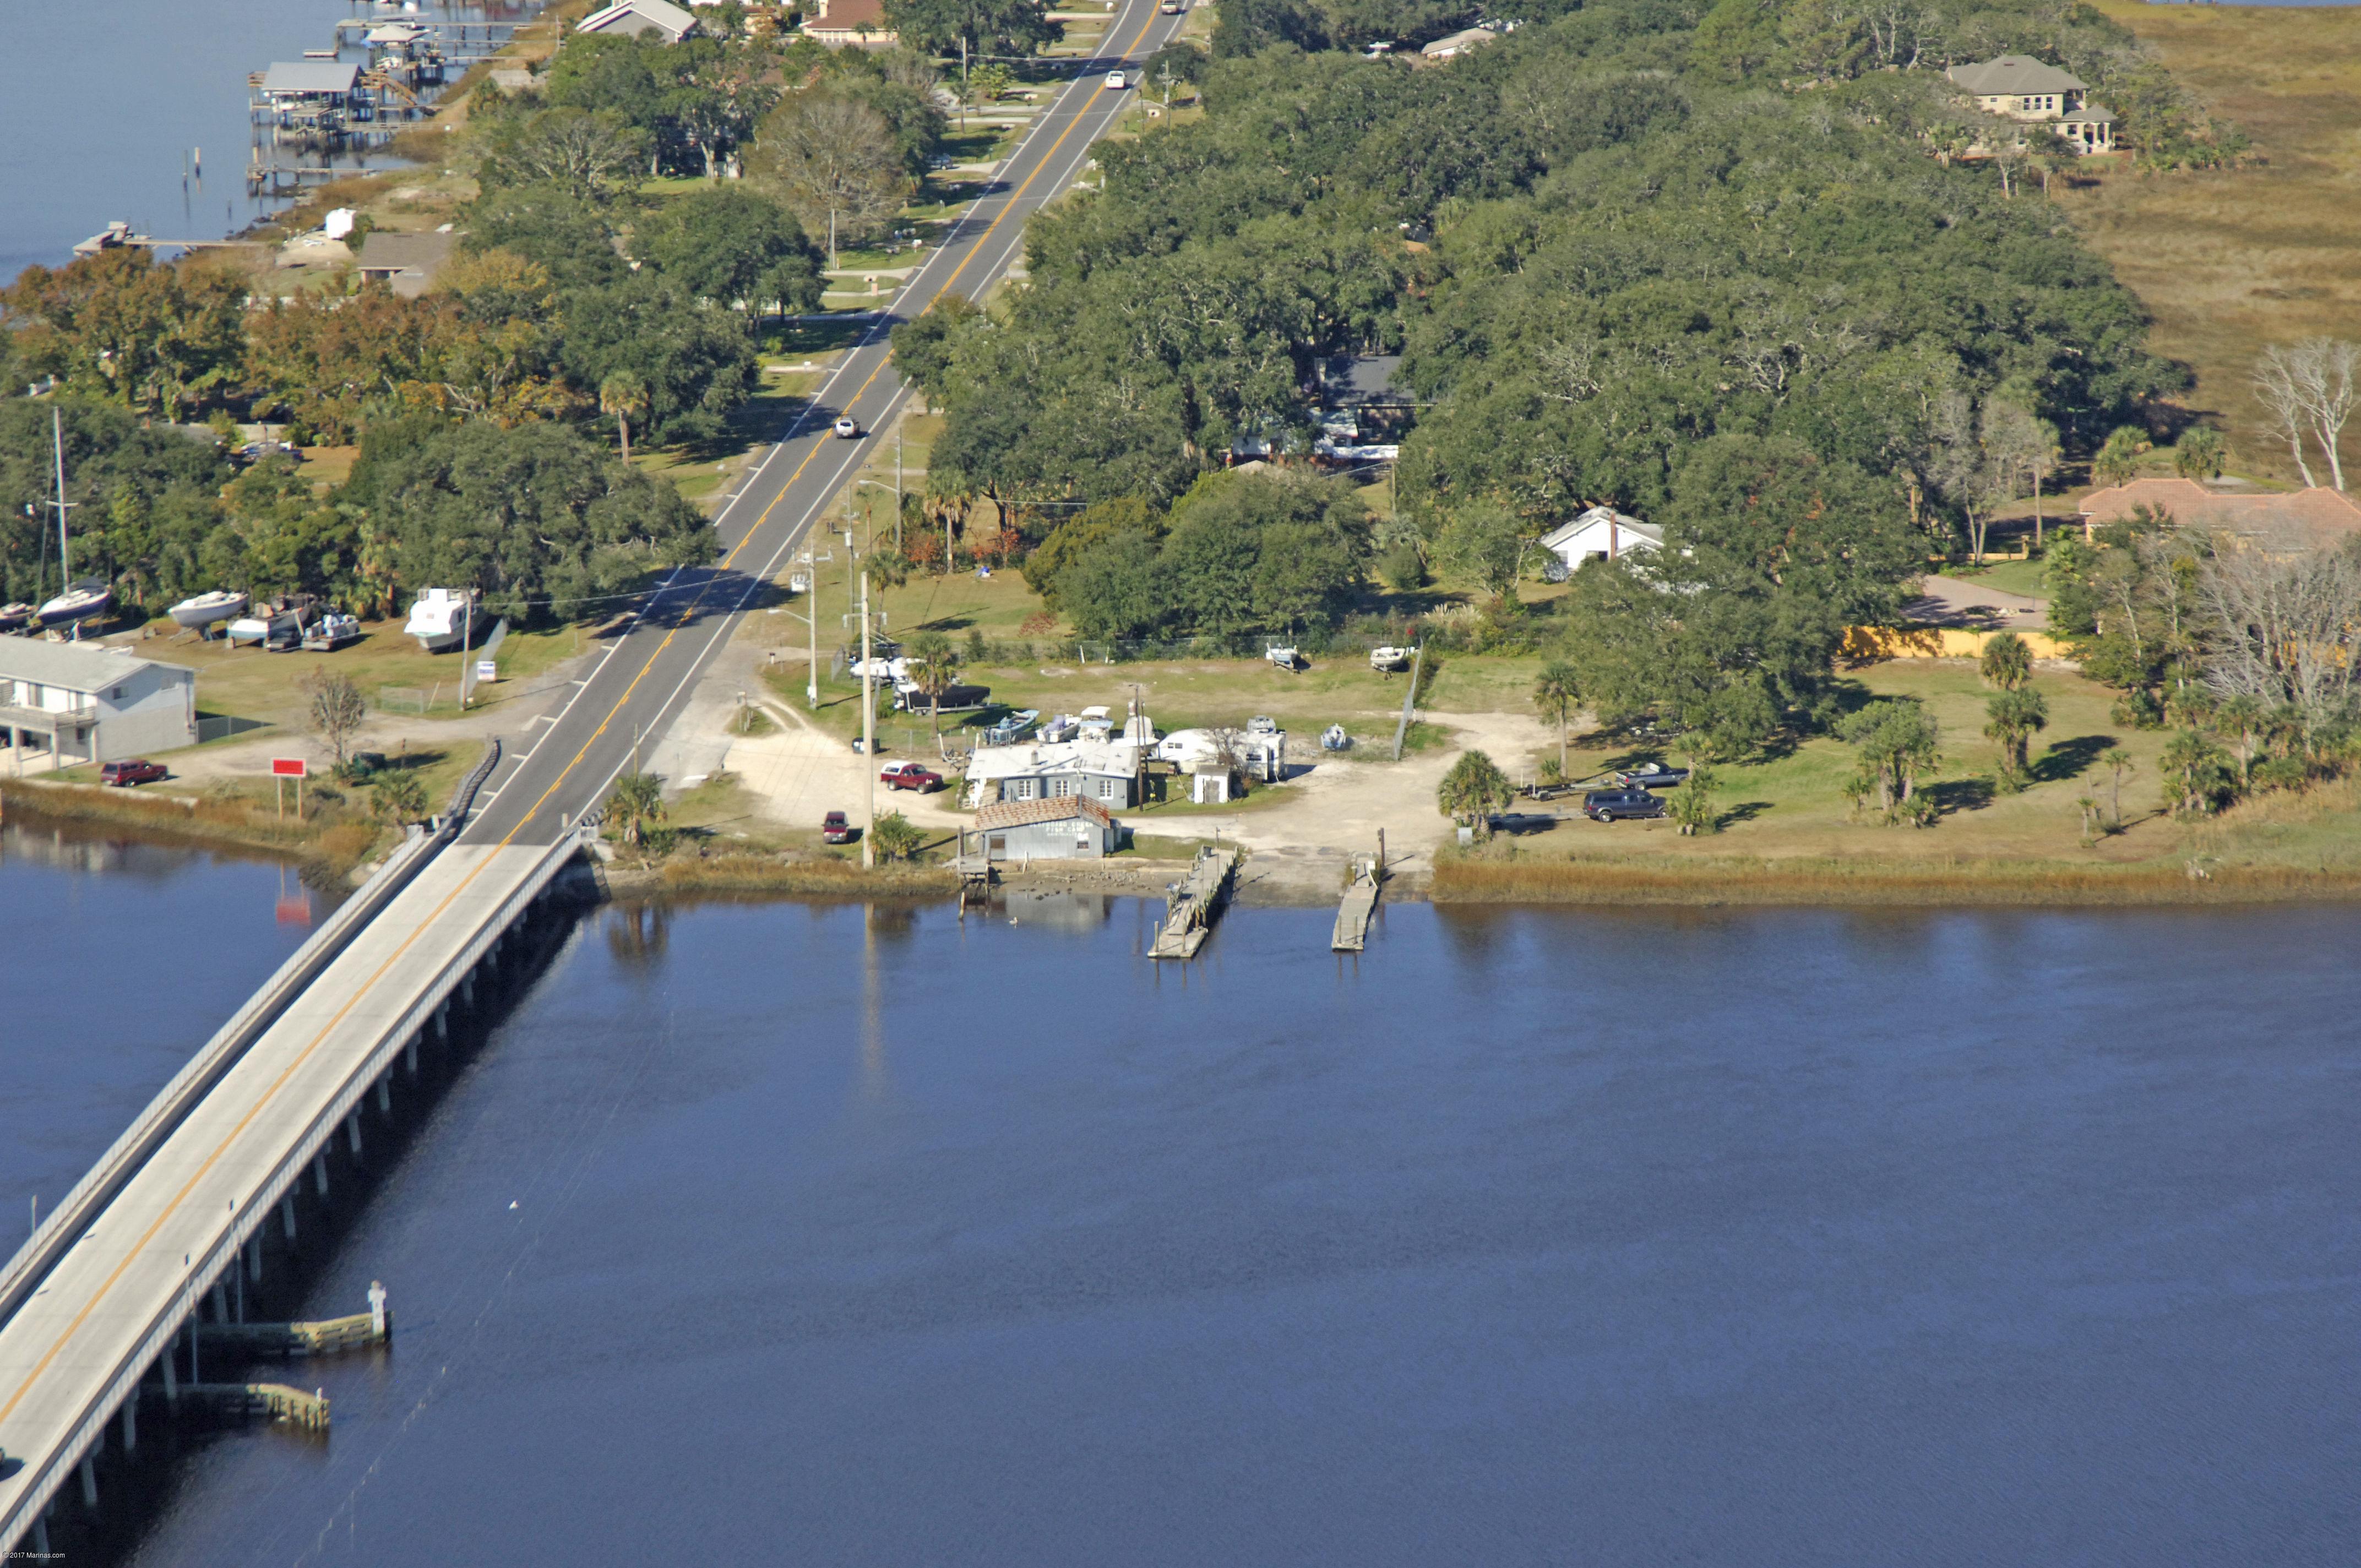 Clapboard creek fish camp in jacksonville fl united for Fish camp jacksonville